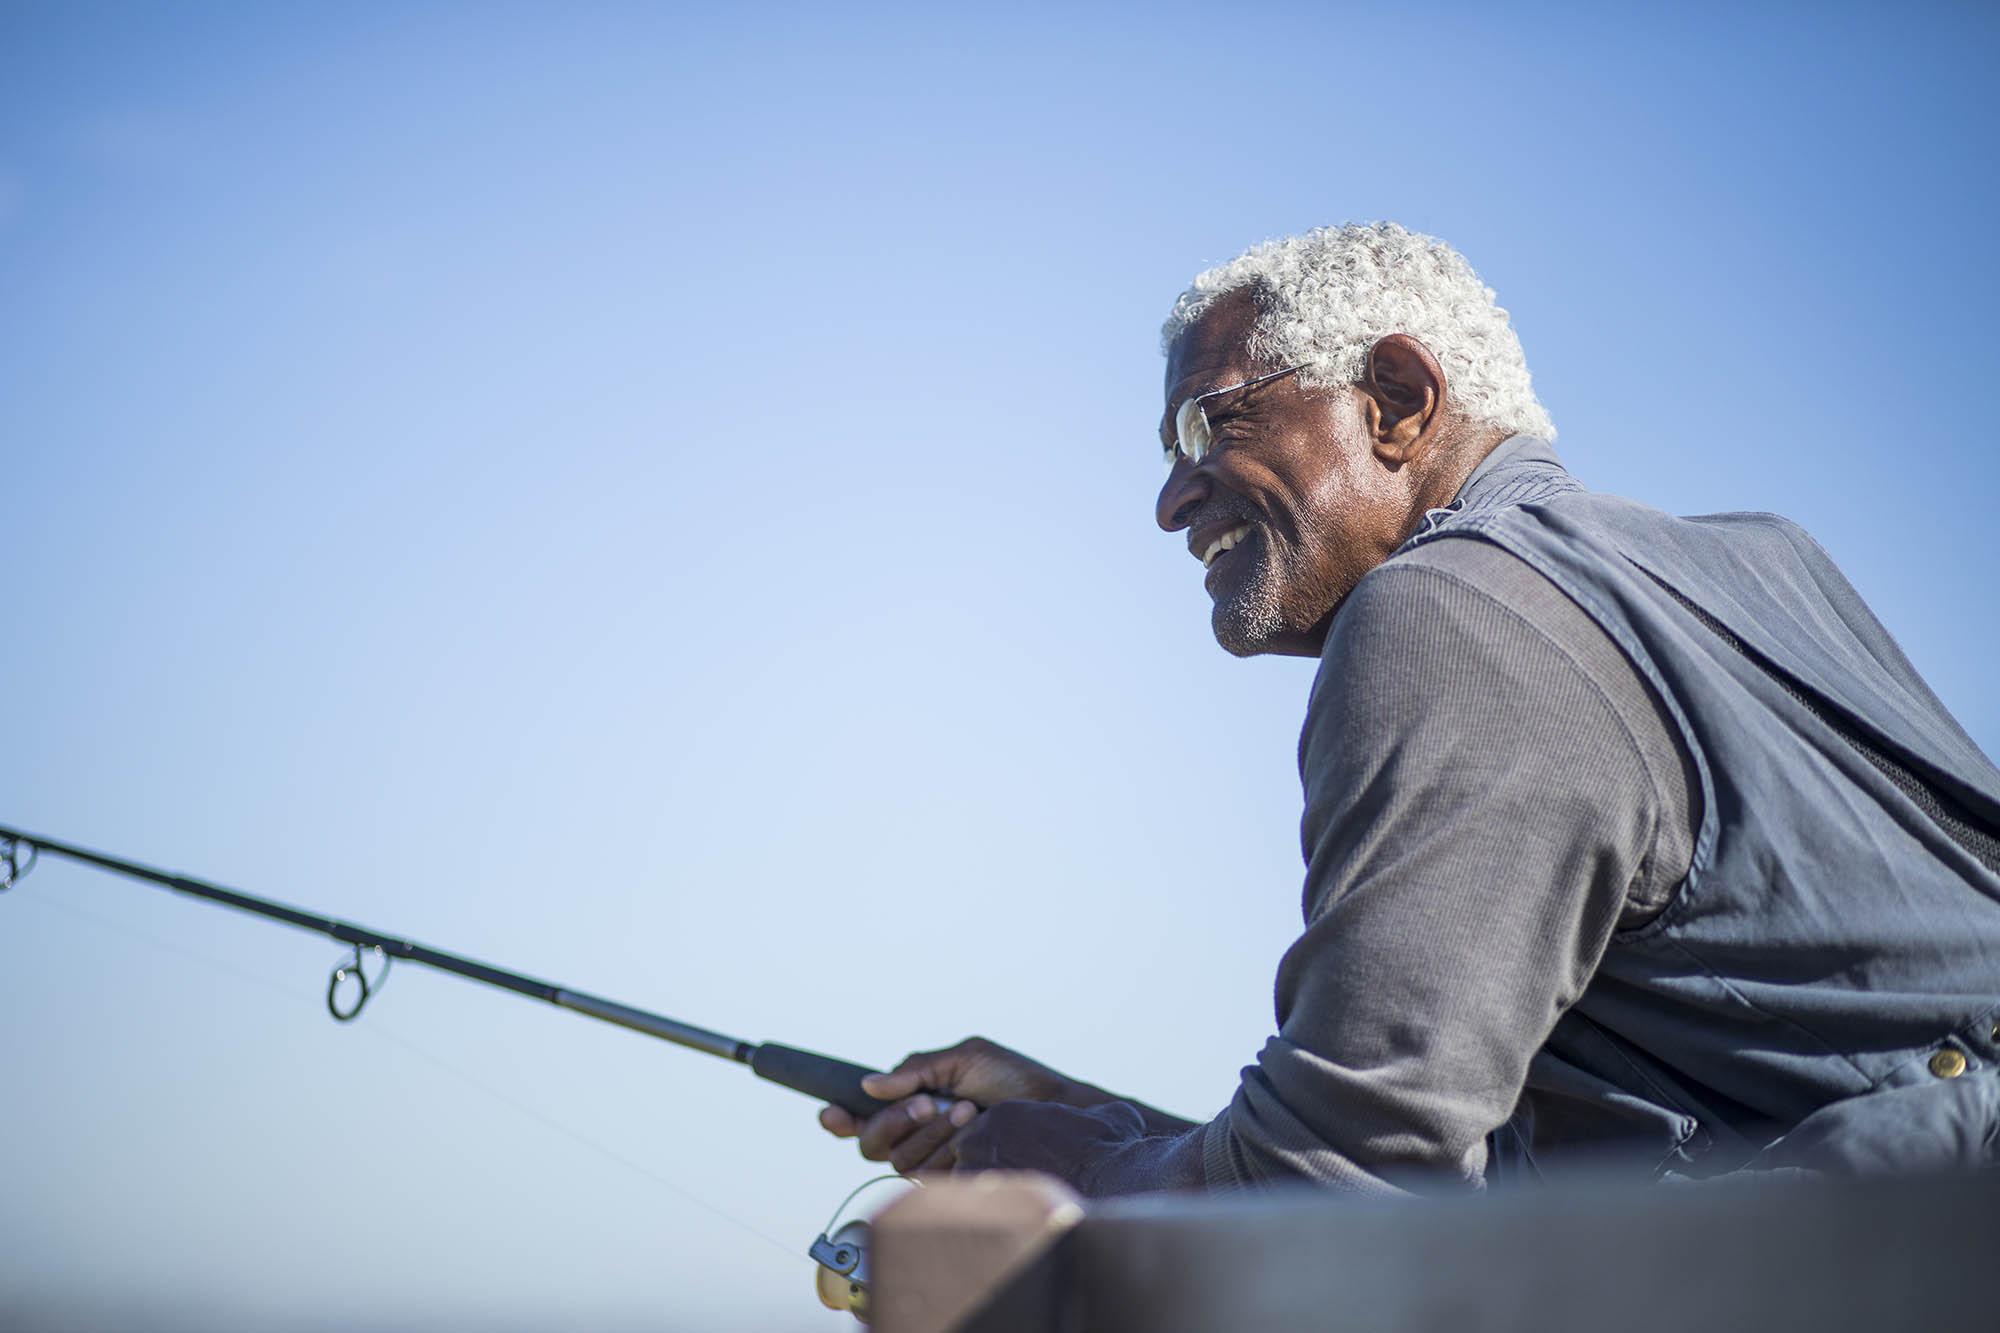 Vericatch fisherman with fishing pole